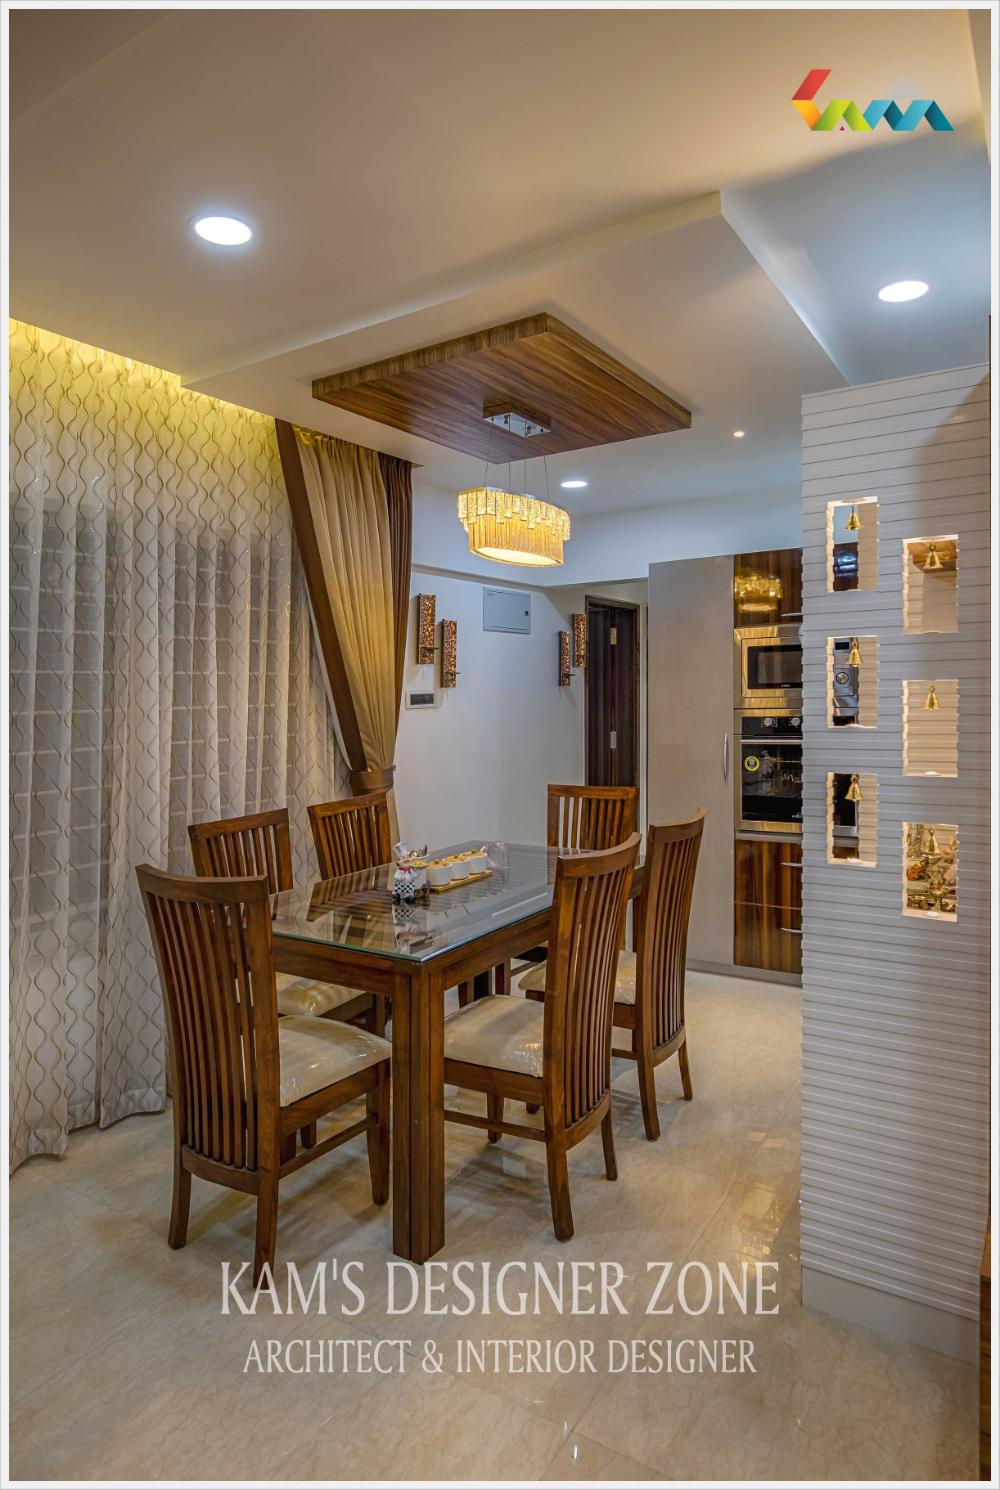 Interior Designer In Jagtap Dairy Kams Designer Pune In 2020